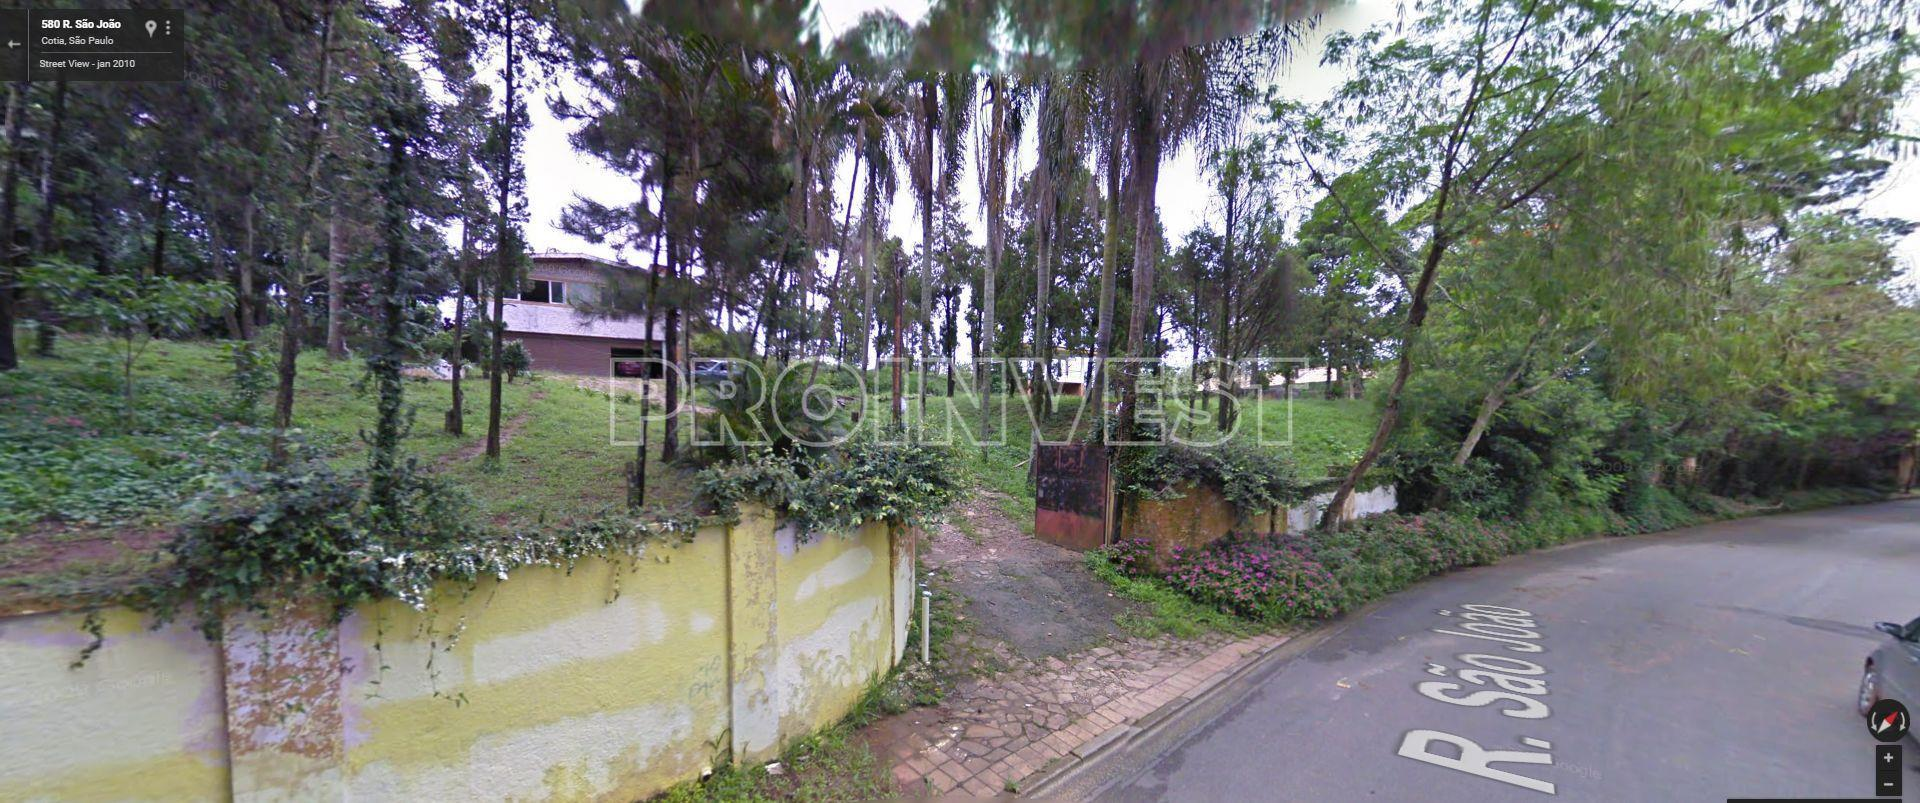 Terreno em Vila Santo Antônio, Cotia - SP